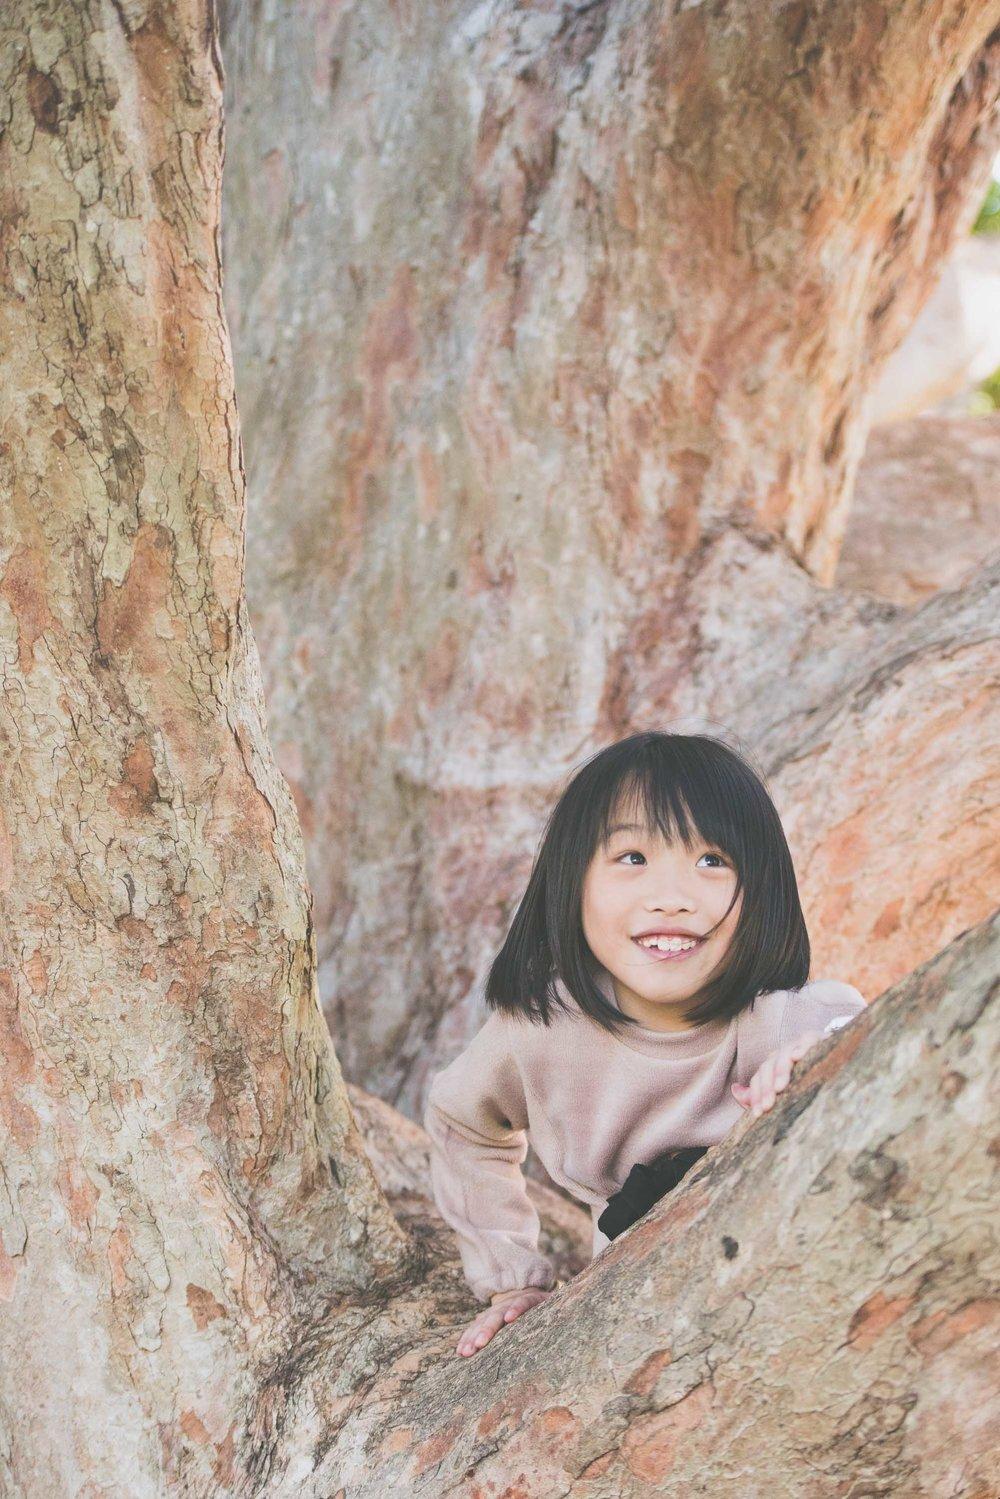 Climbing a tree - Photo credit Nicola Bailey.jpg